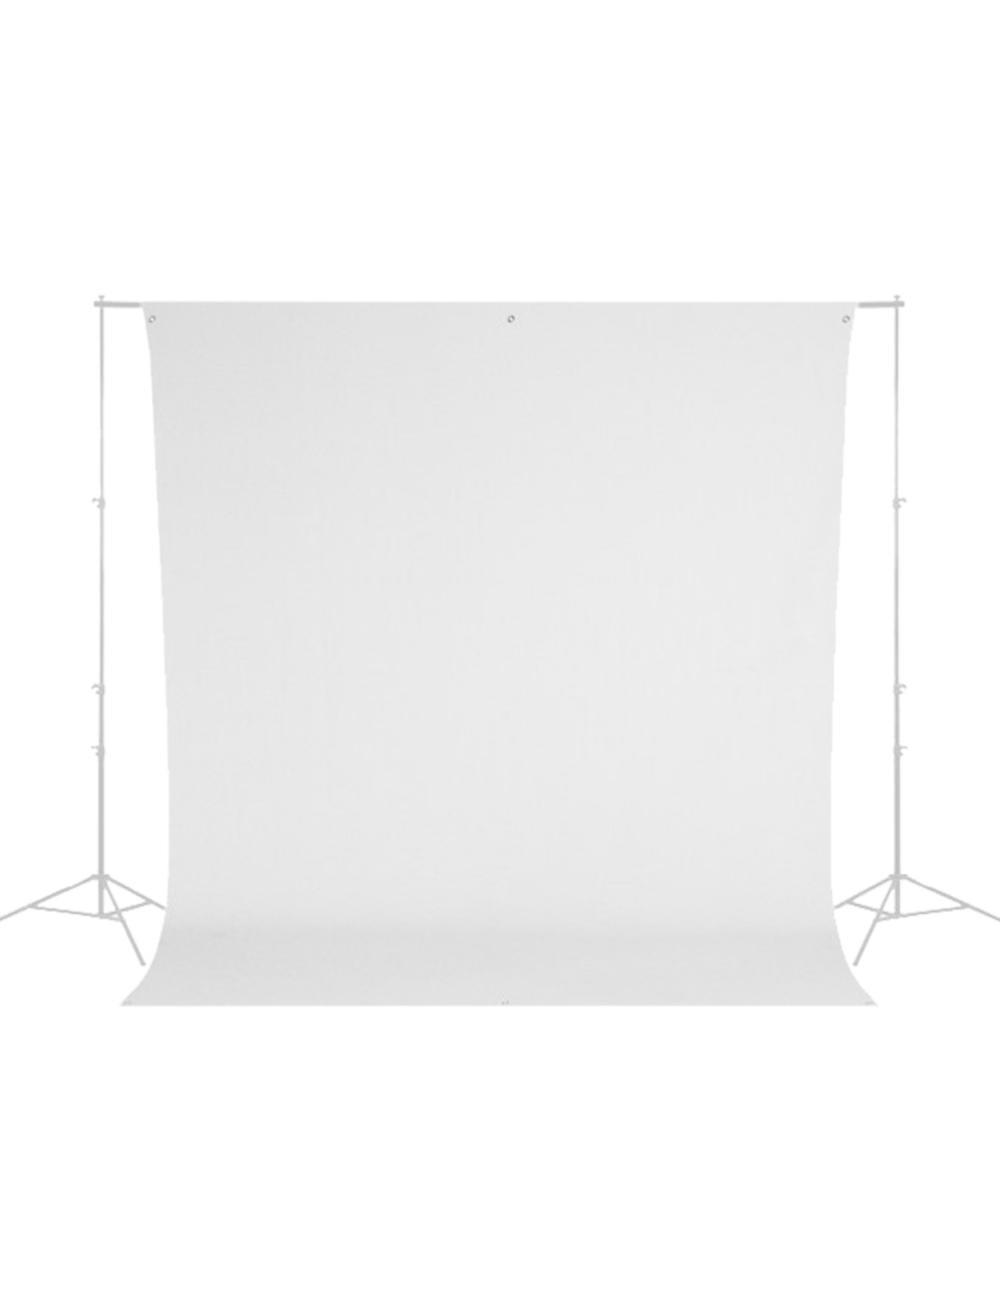 Westcott Wrinkle-Resistant Backdrop - High-Key White